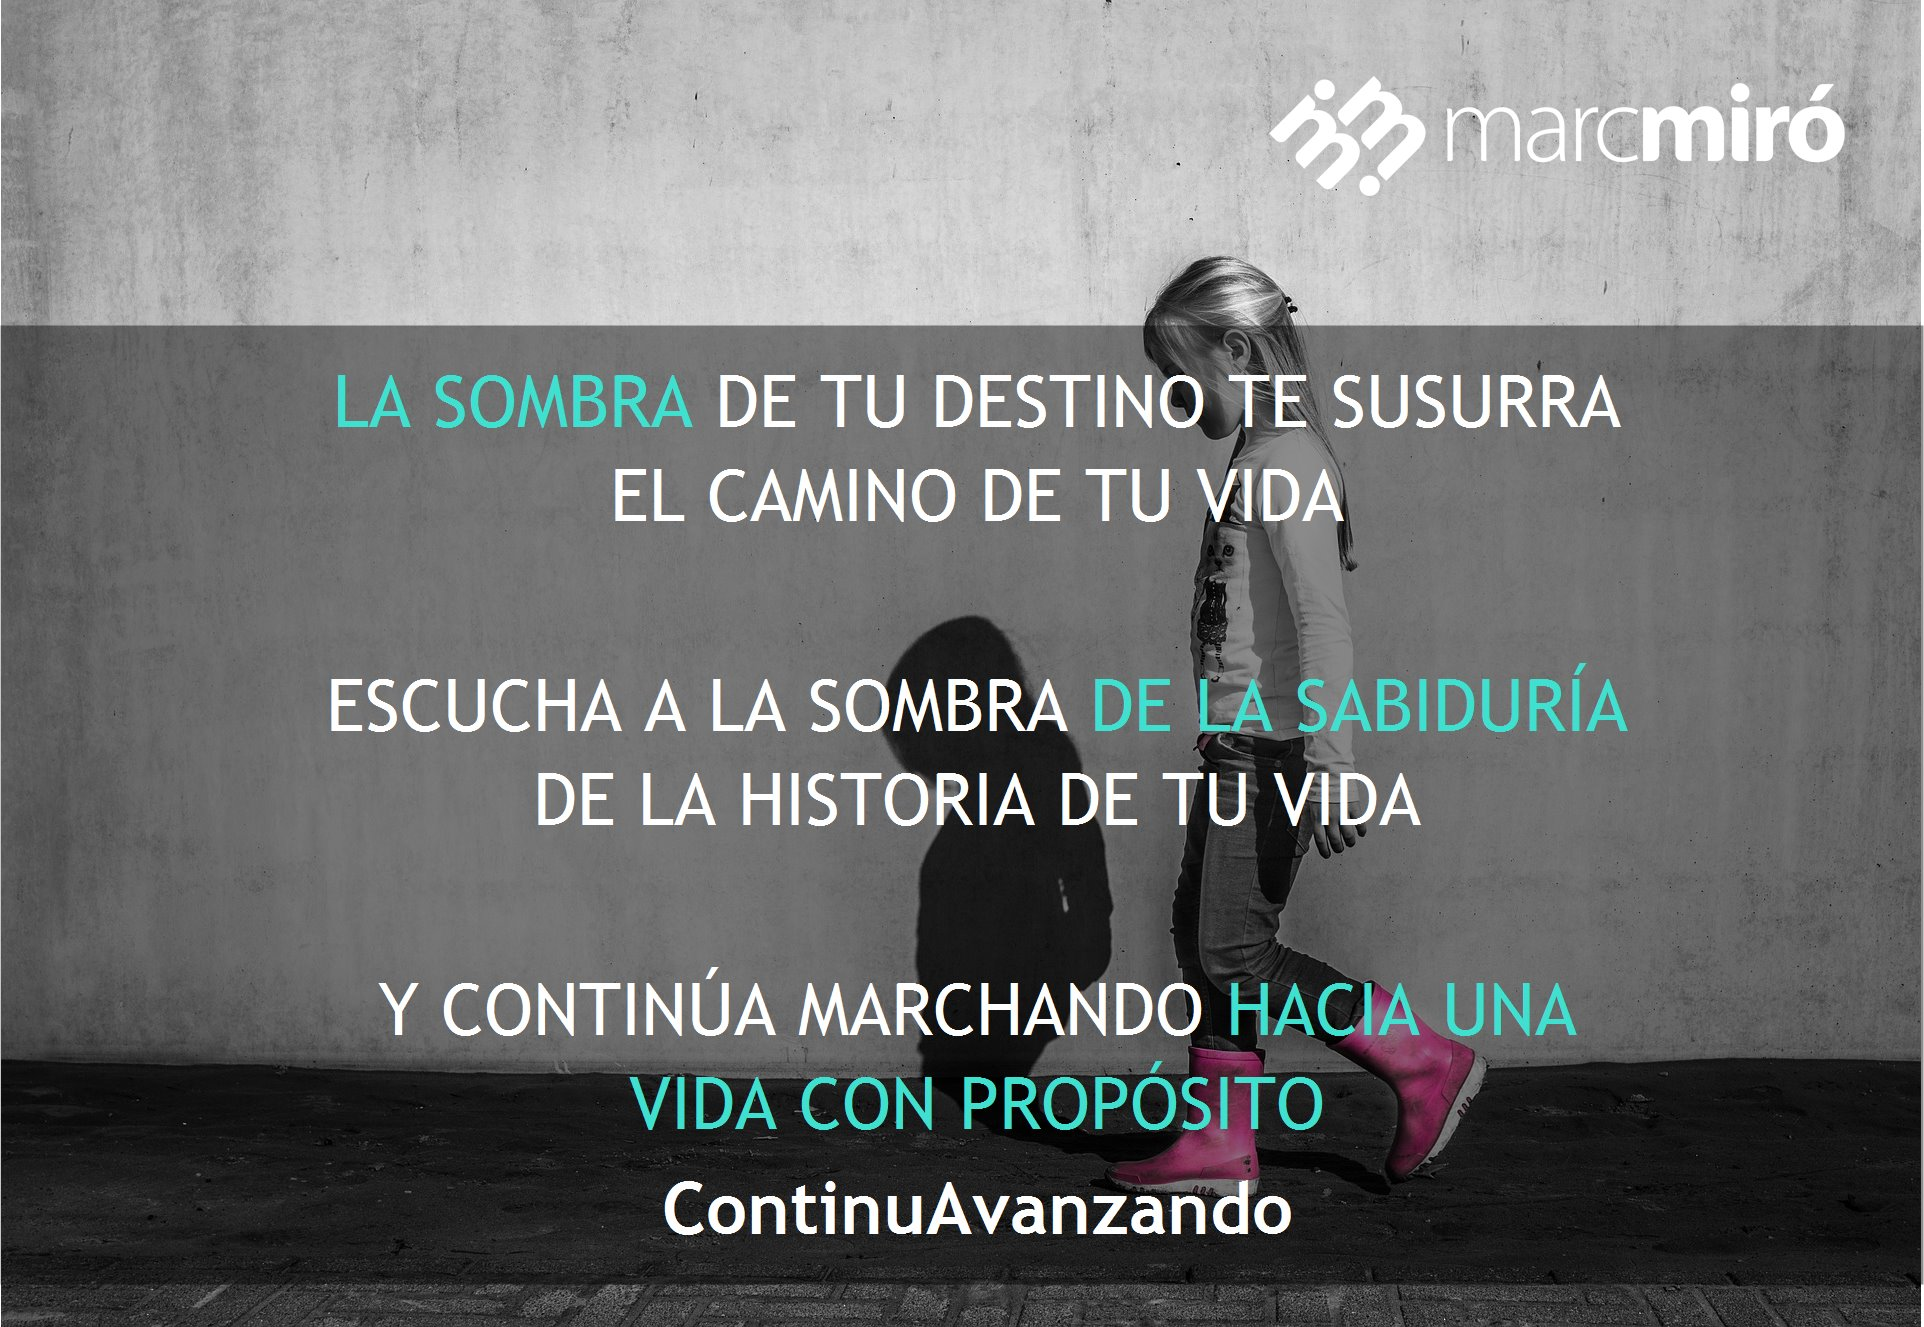 marc-miro-coach-speaker-liderazgo-prosperidad-exito-marcmiro-emprendedor-77